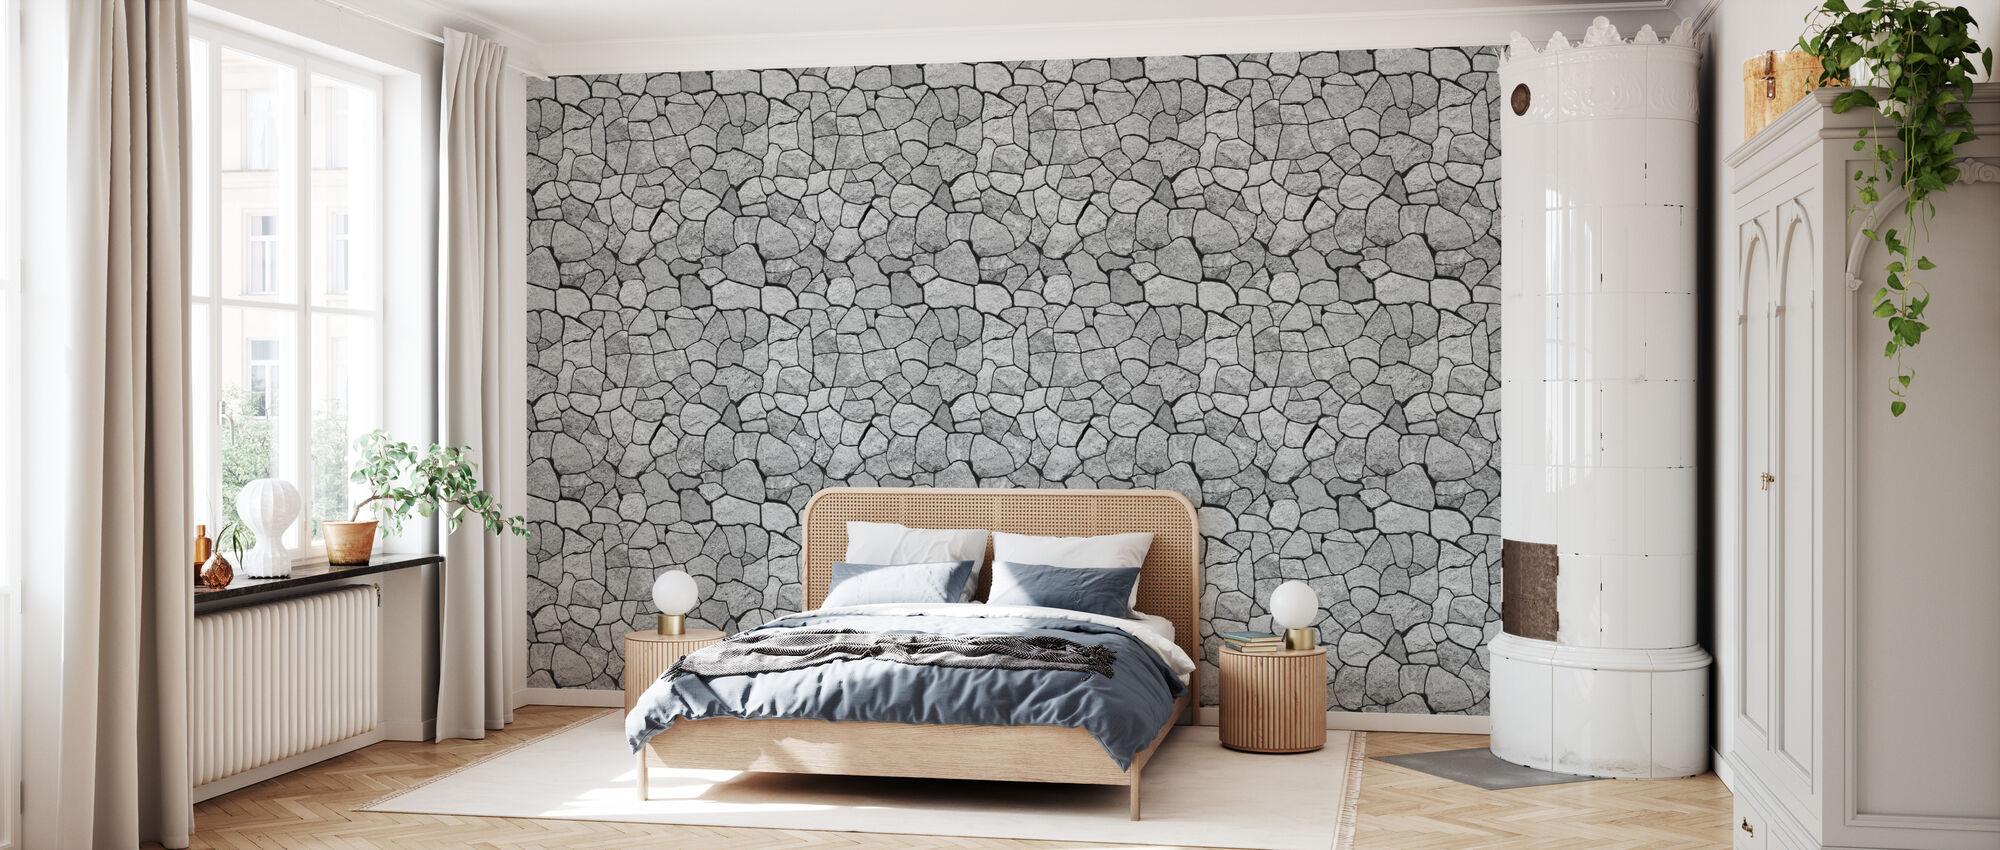 Granite Wall - Wallpaper - Bedroom